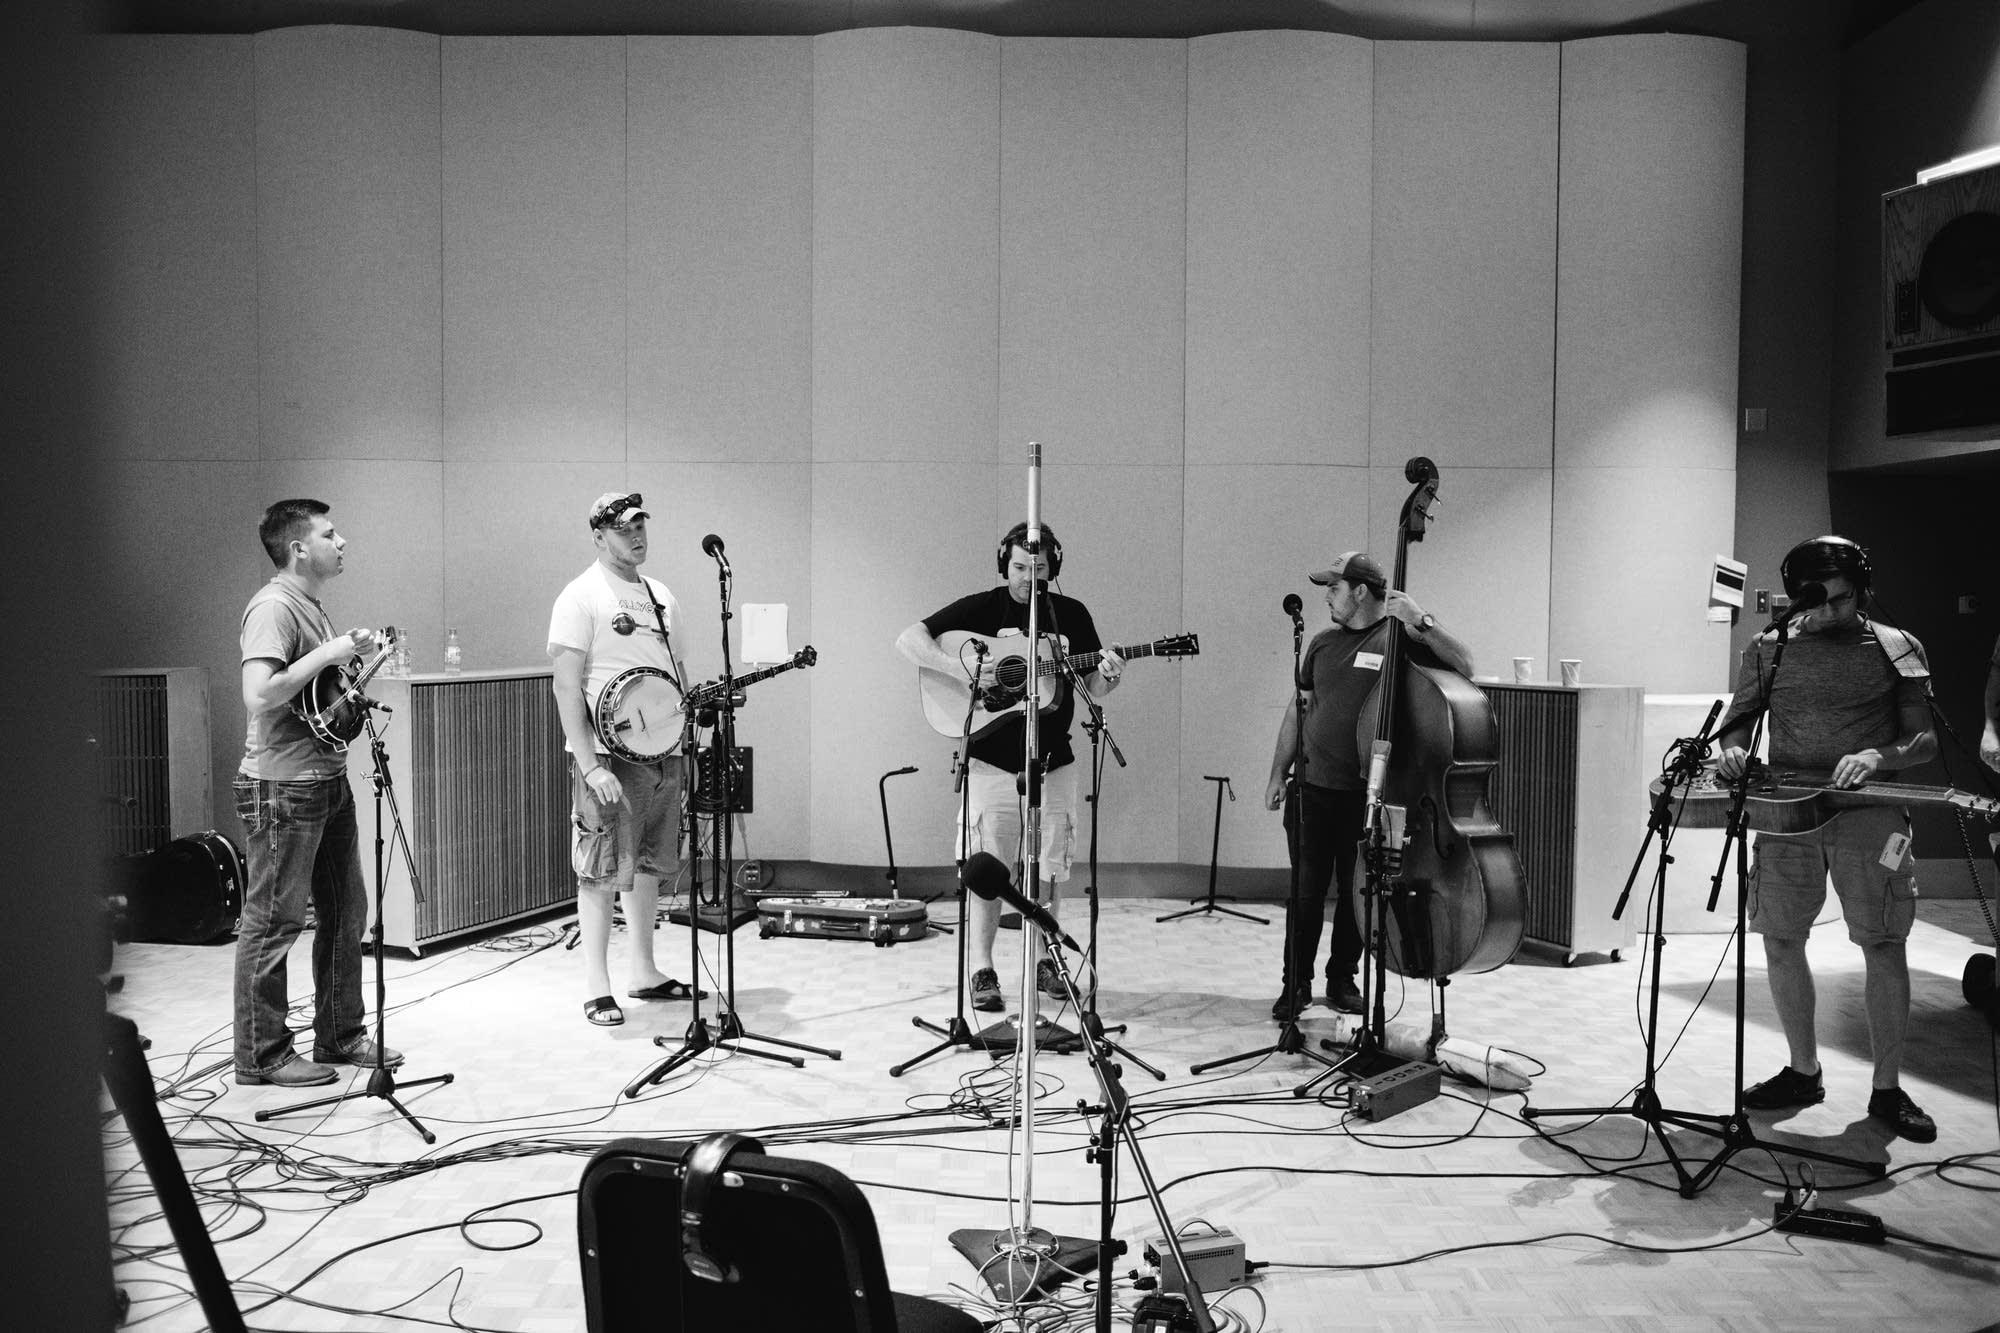 The Clay Hess Band perform at Radio Heartland